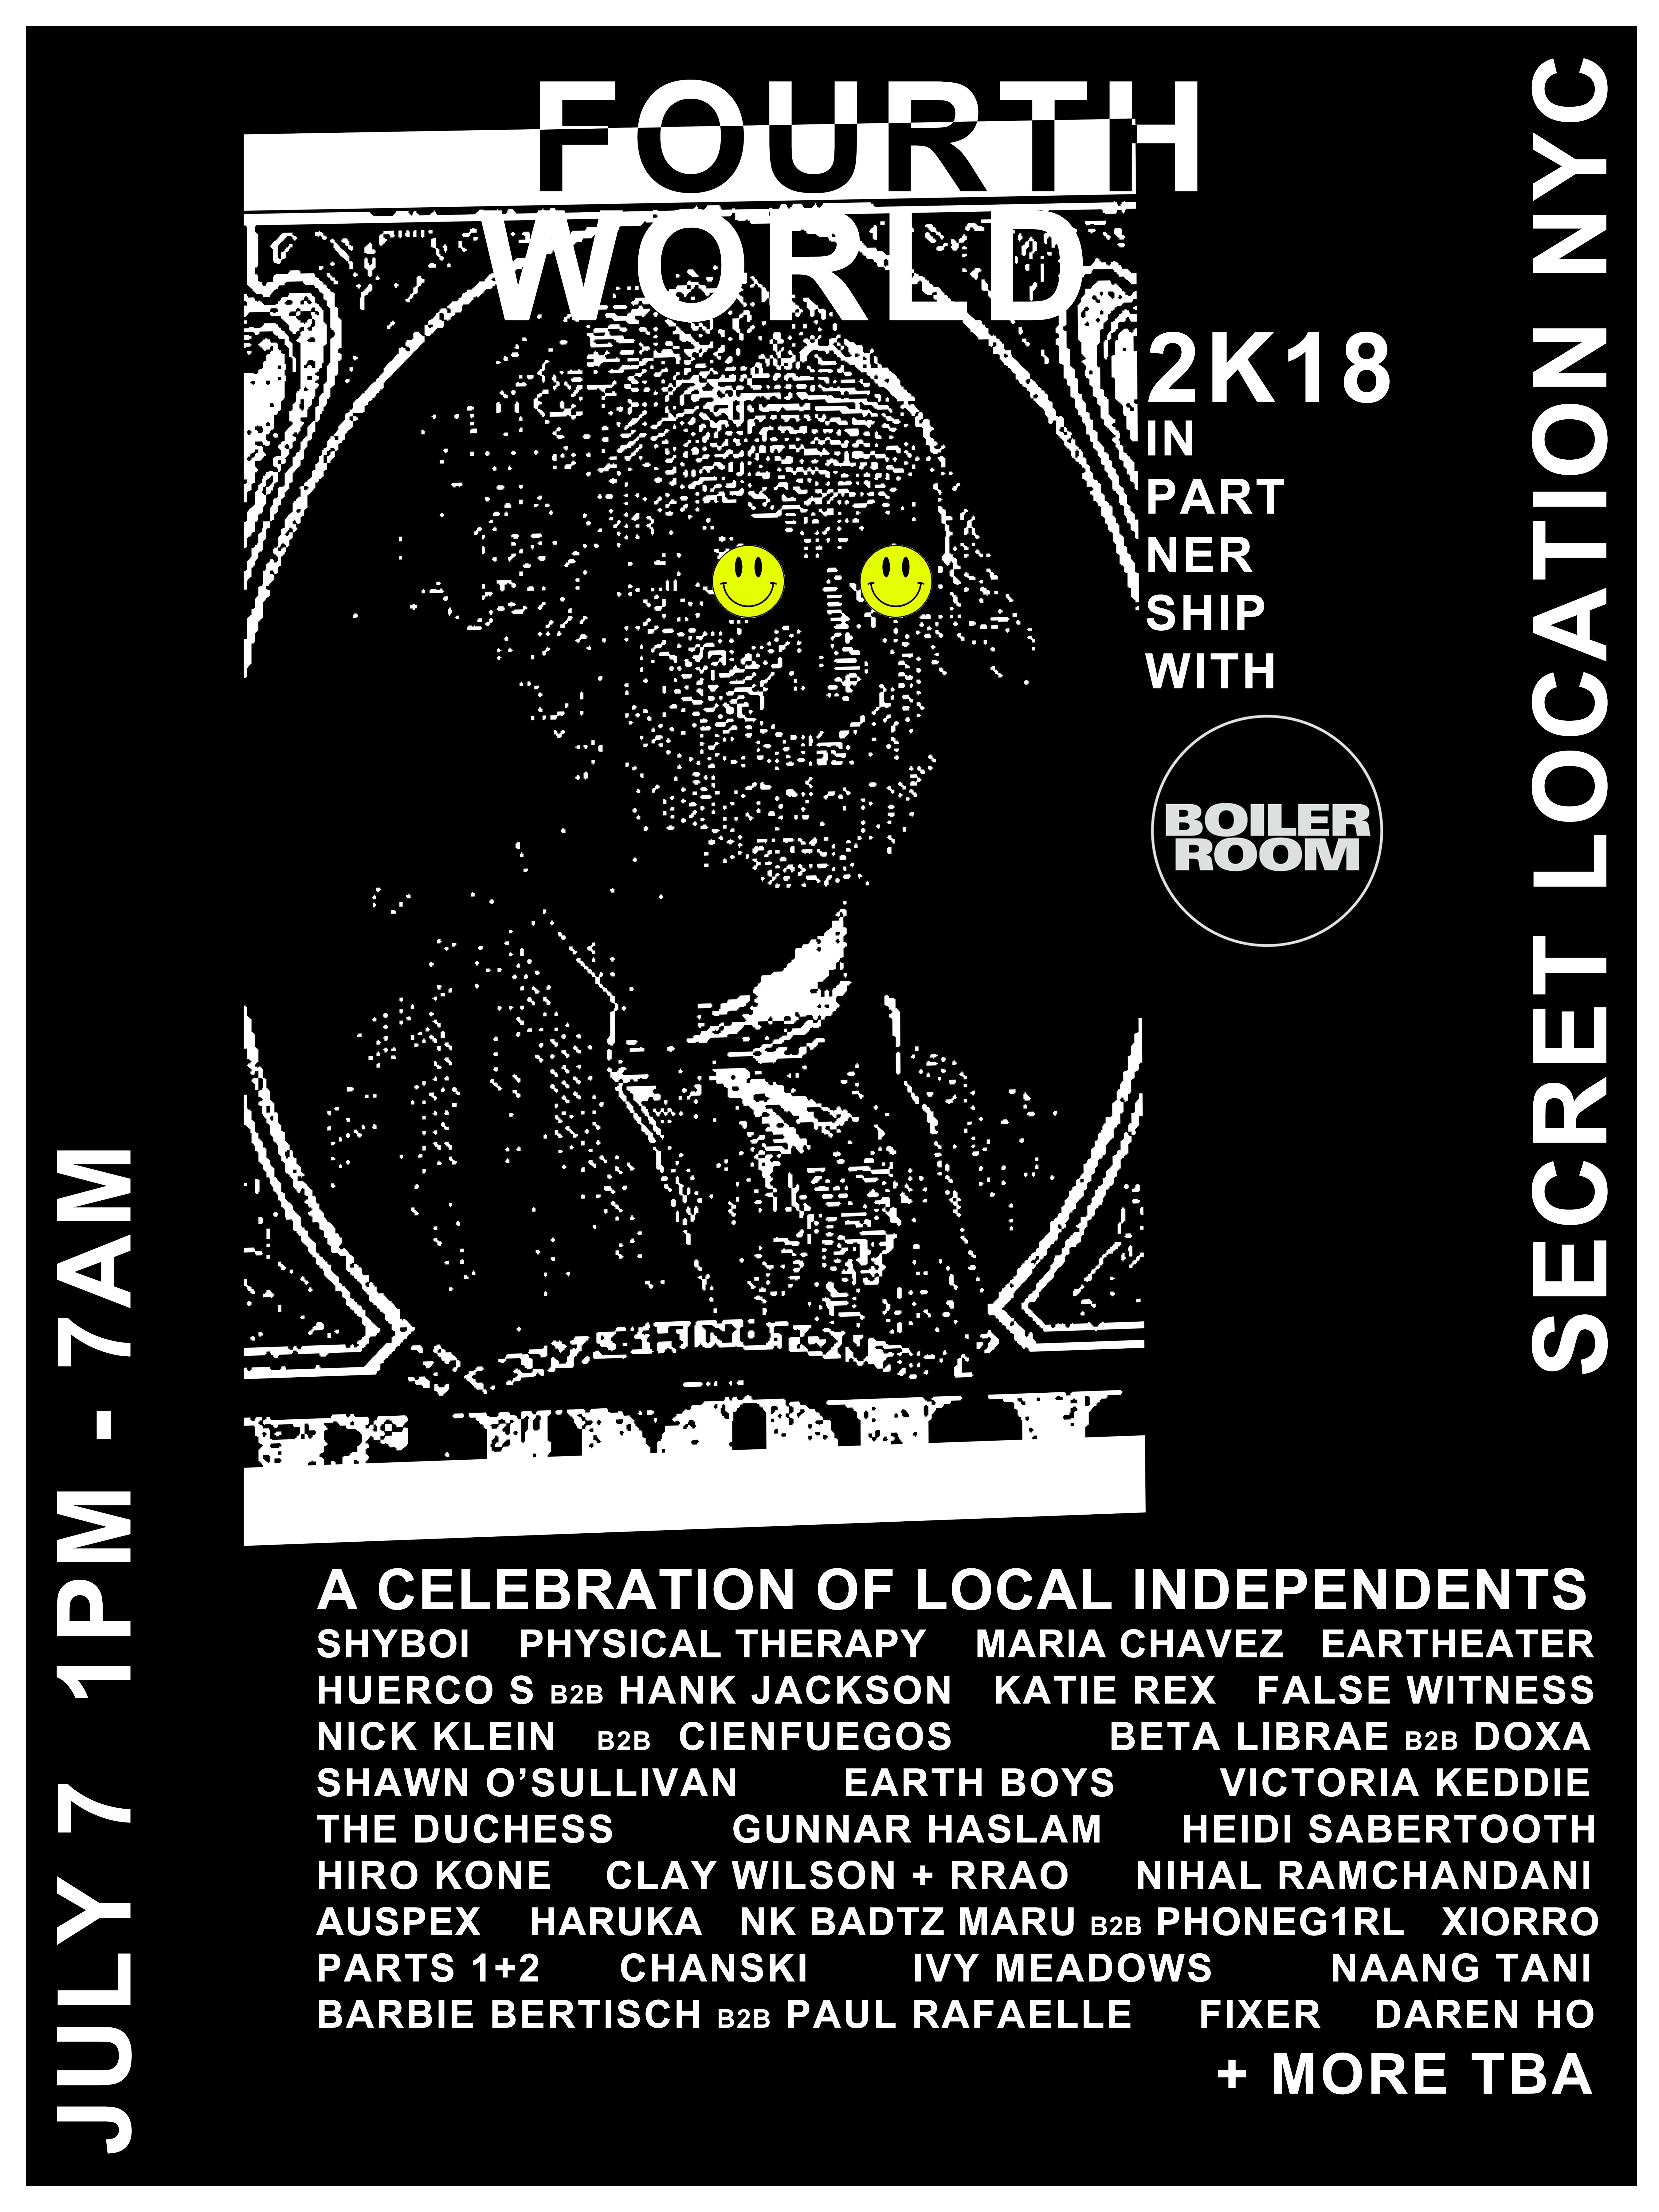 Fourth World 2K18 Flyer Image